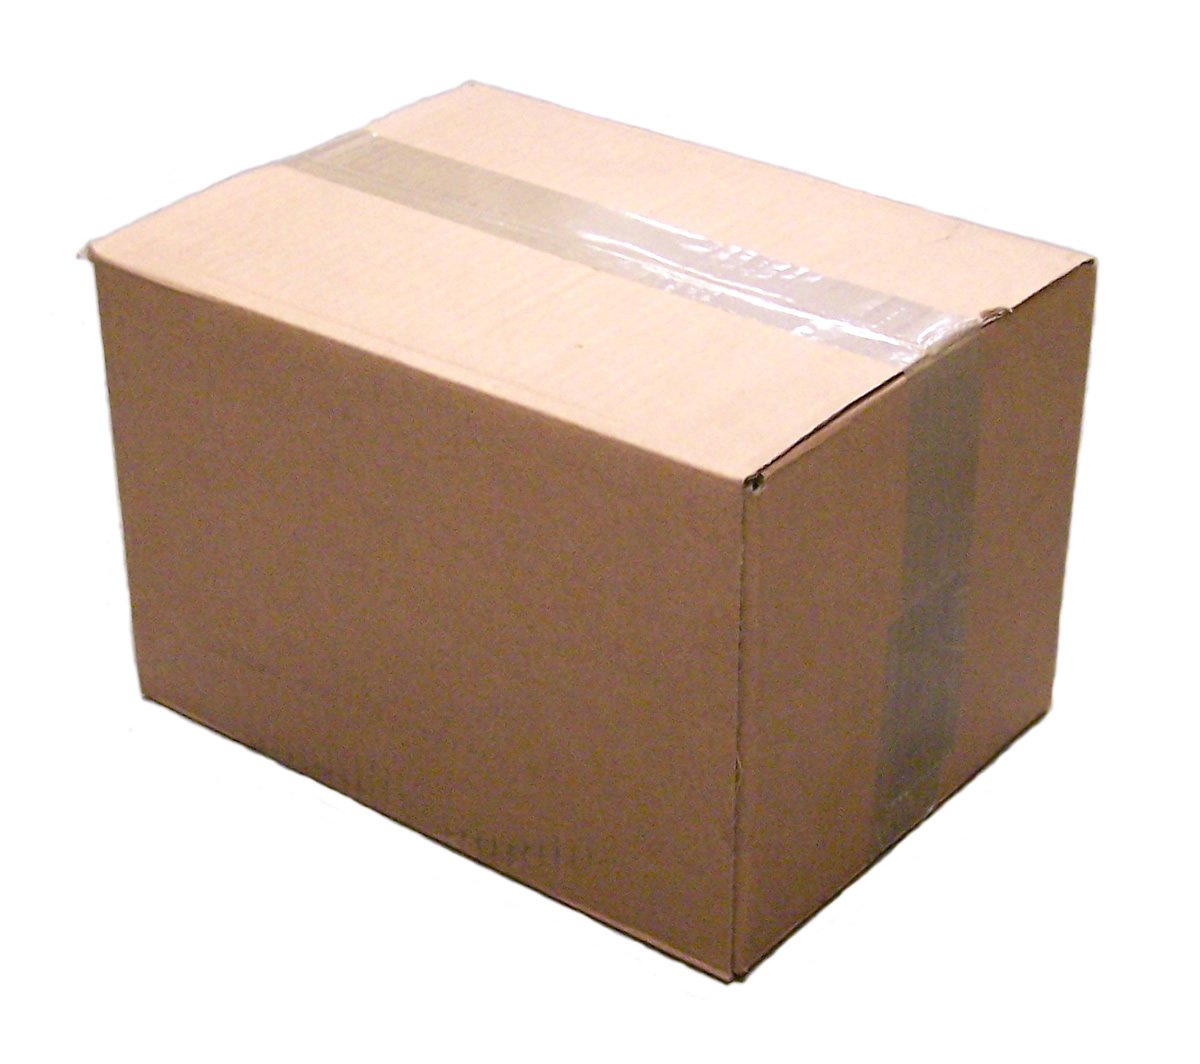 boite emballage carton free photo files 1425698. Black Bedroom Furniture Sets. Home Design Ideas